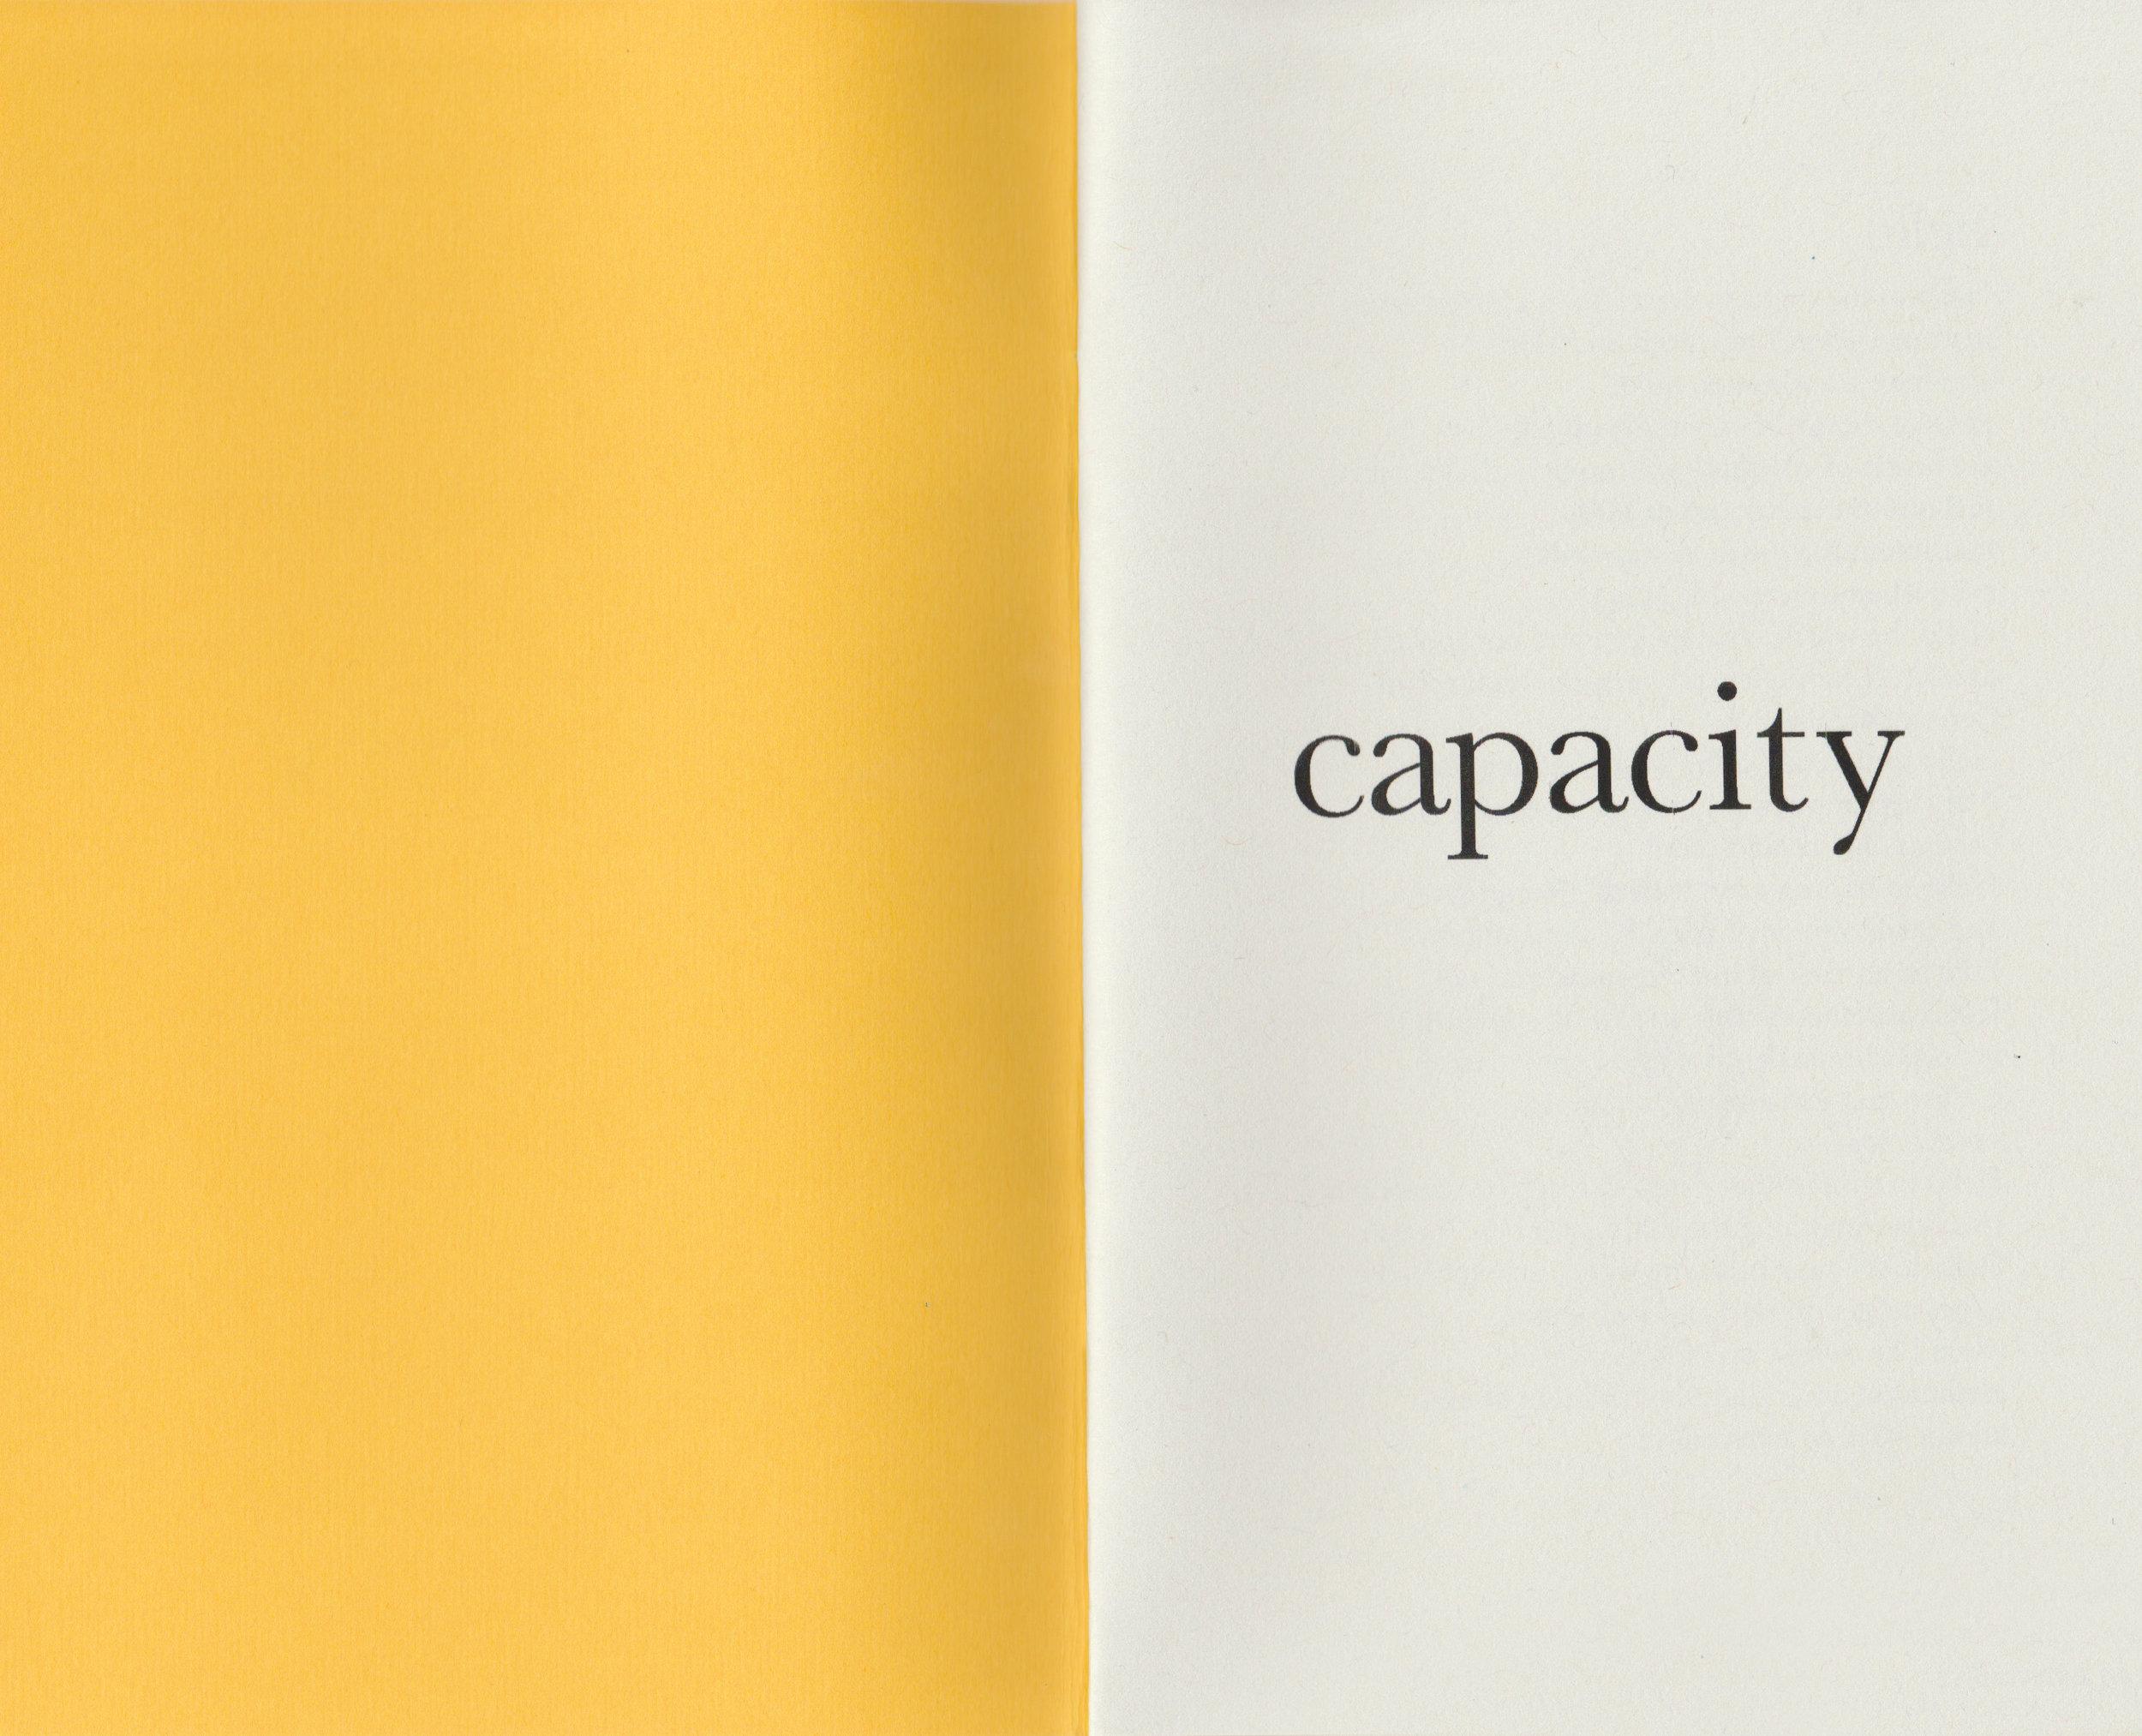 Capacity_1.jpg